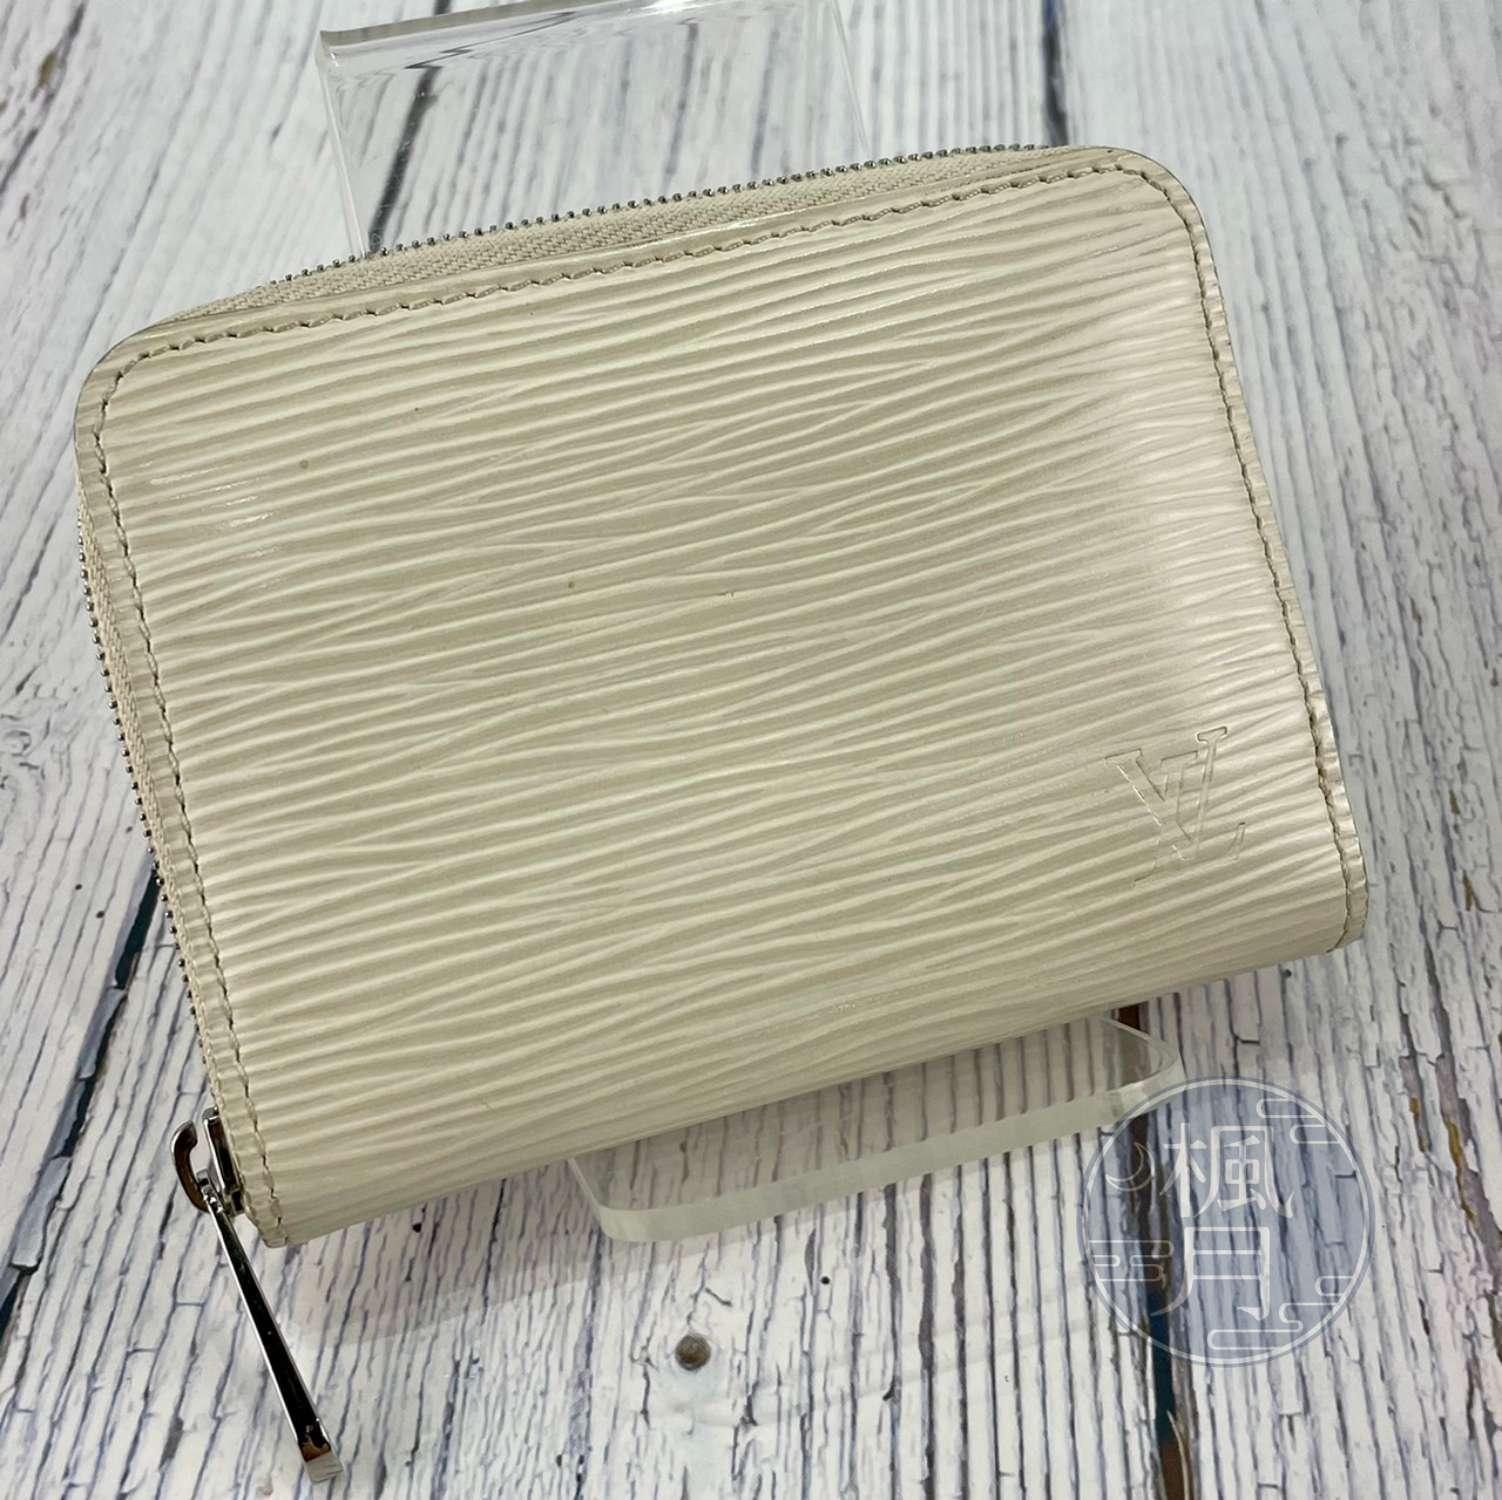 BRAND楓月 LOUIS VUITTON LV 路易威登 M6015J 白EPI拉鍊零錢包 錢包 皮夾 錢夾 短夾